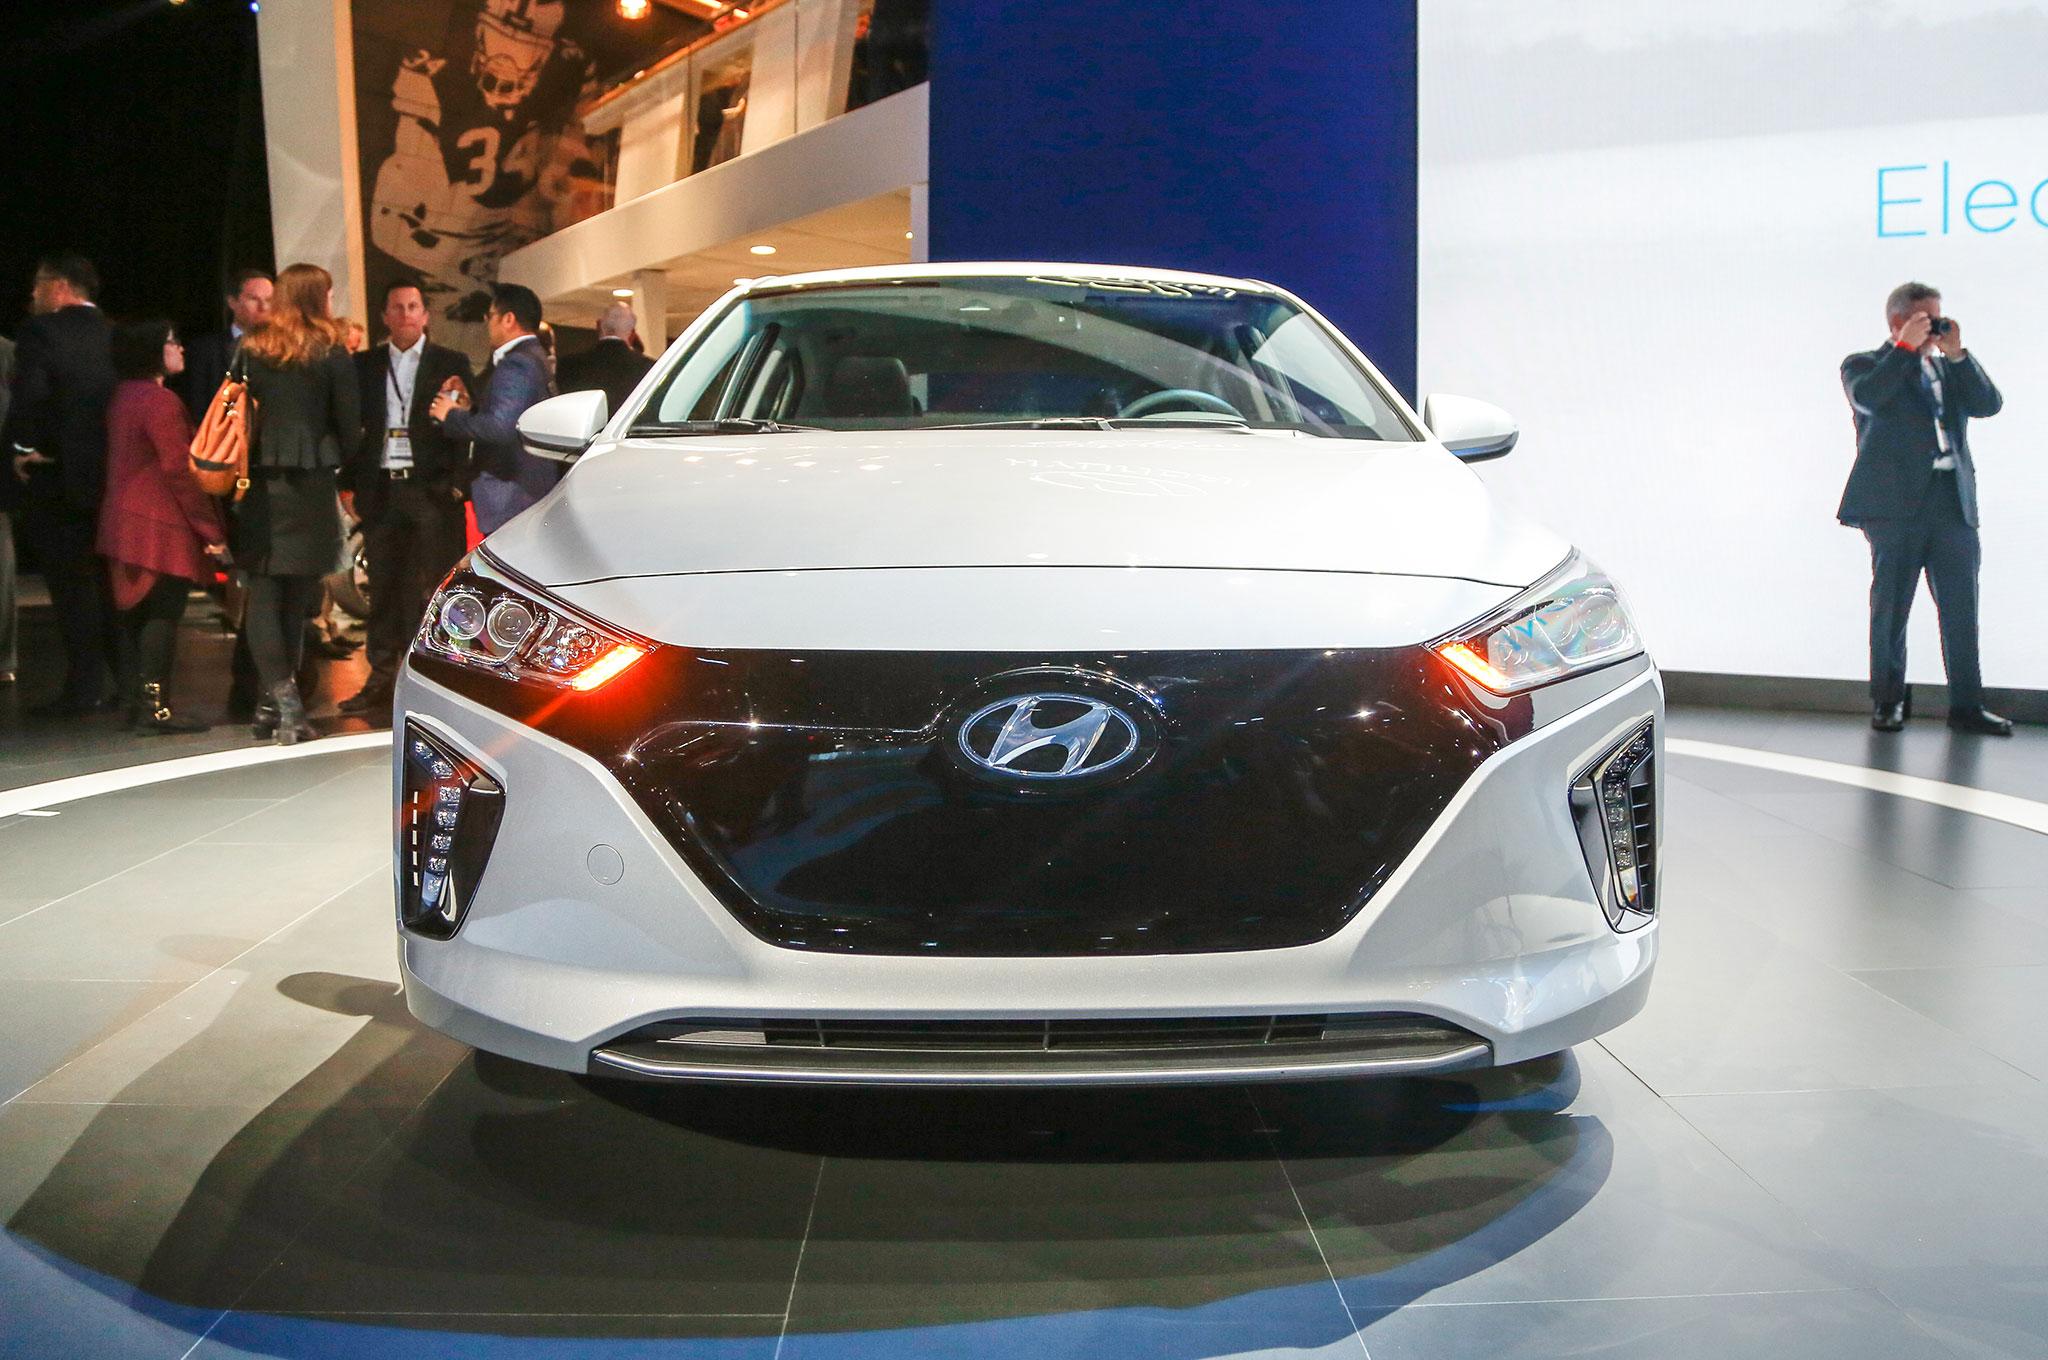 http://st.automobilemag.com/uploads/sites/11/2016/03/2017-Hyundai-Ioniq-Electric-front-end.jpg